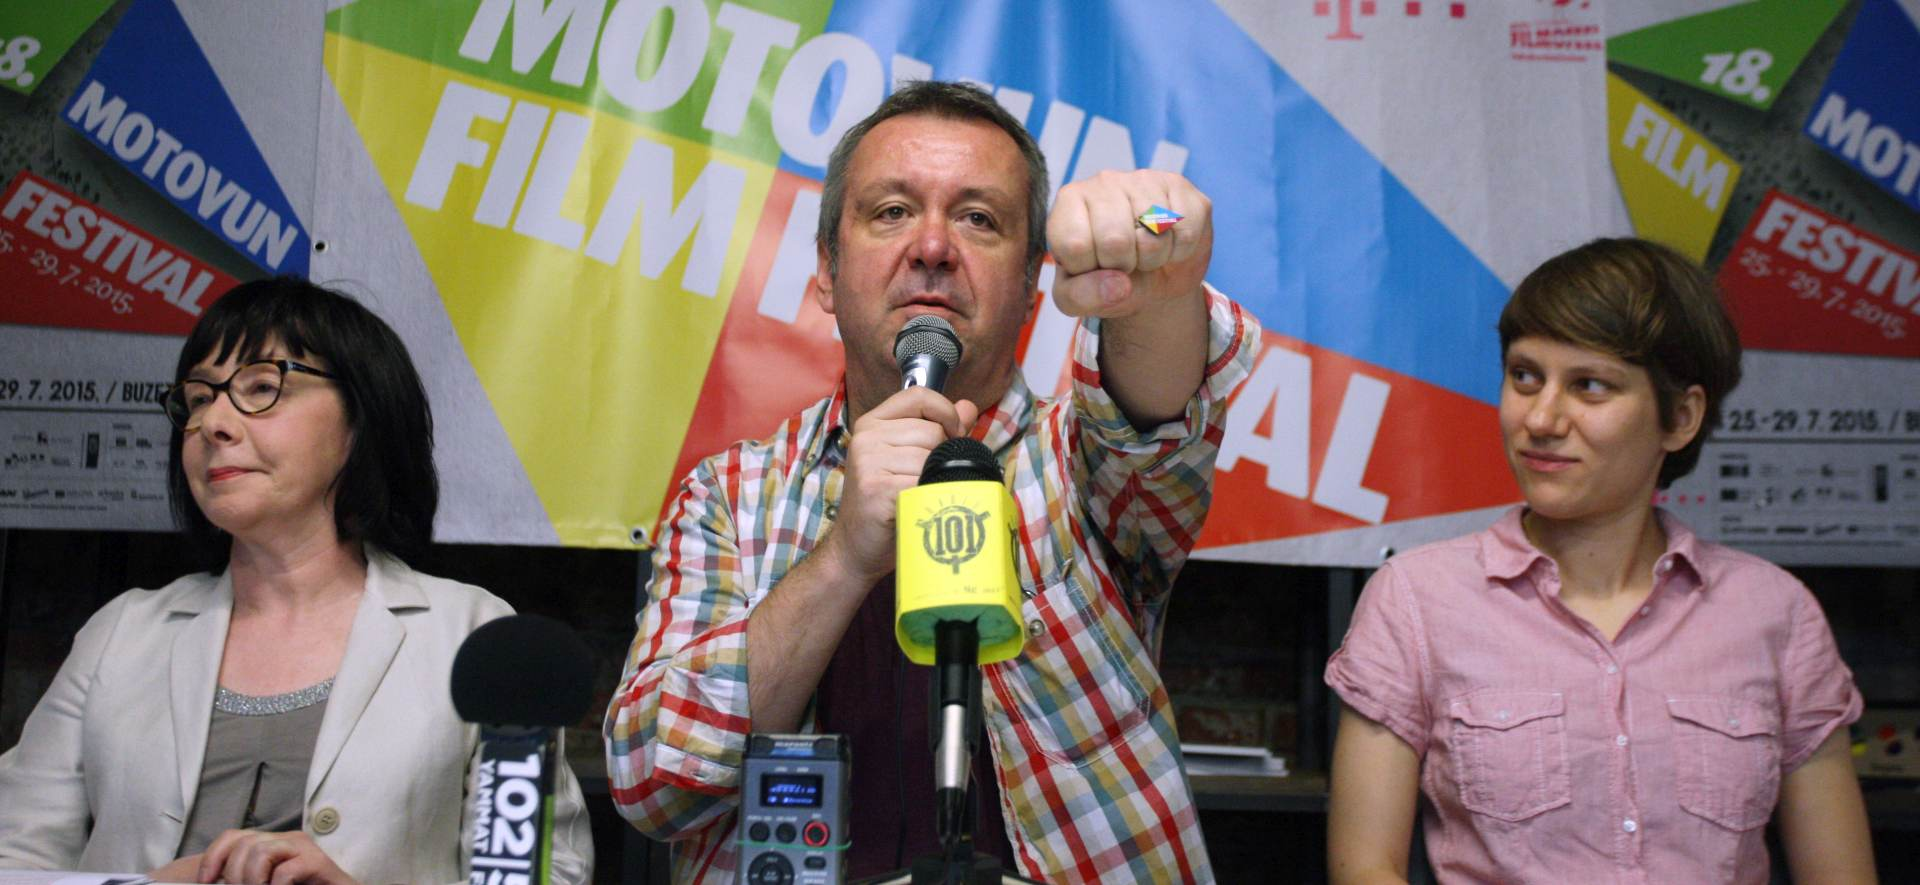 FILMOFILSKA POSLASTICA: Motovun Film Festival u francuskom duhu